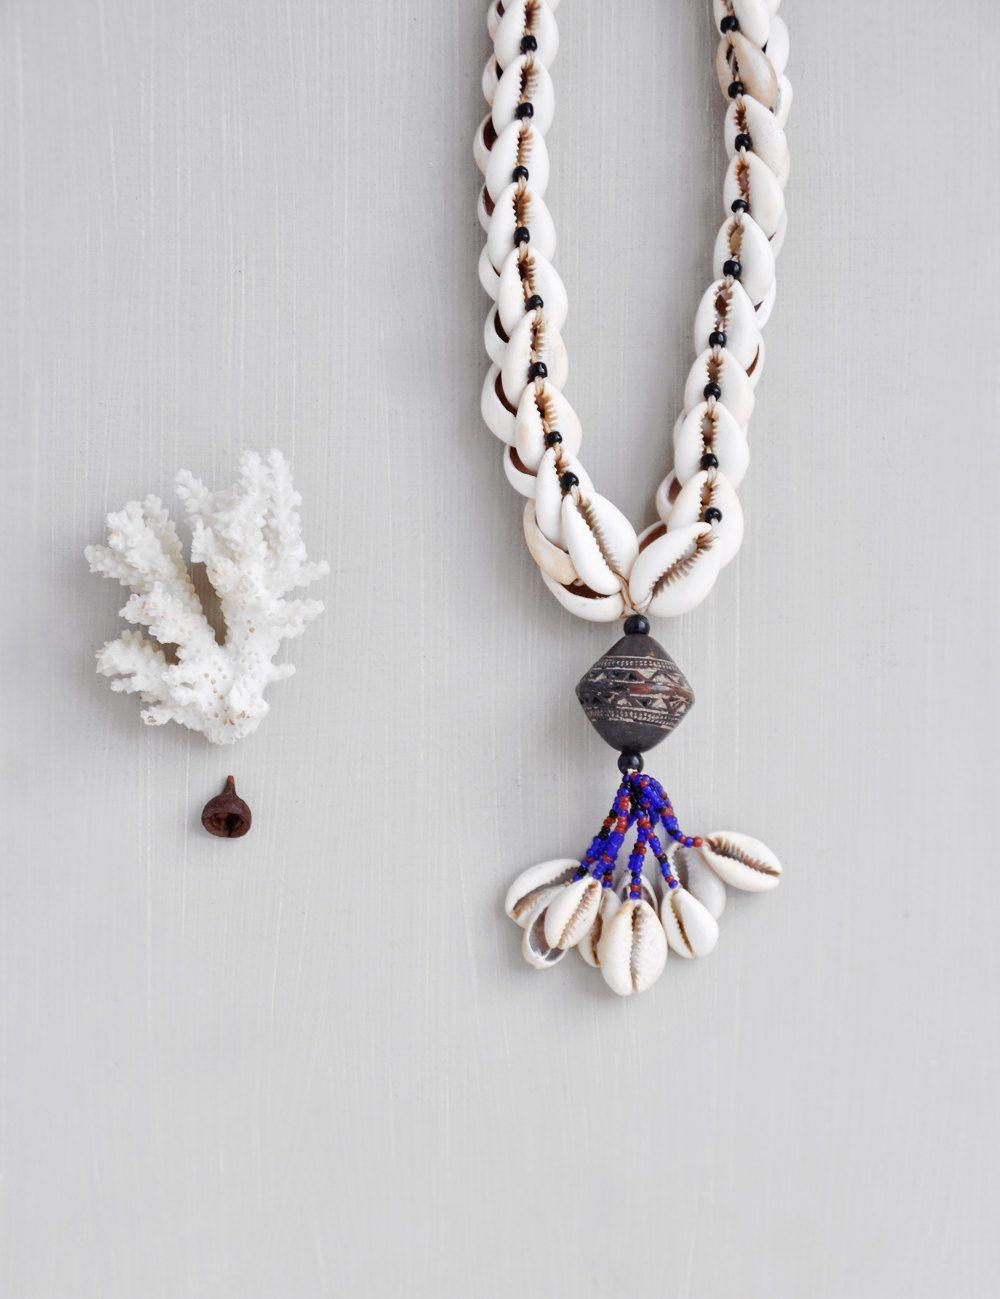 Vintage Cowrie Shell Necklace  Seashell Tassel Pendant  Tribal Boho  Jewelry